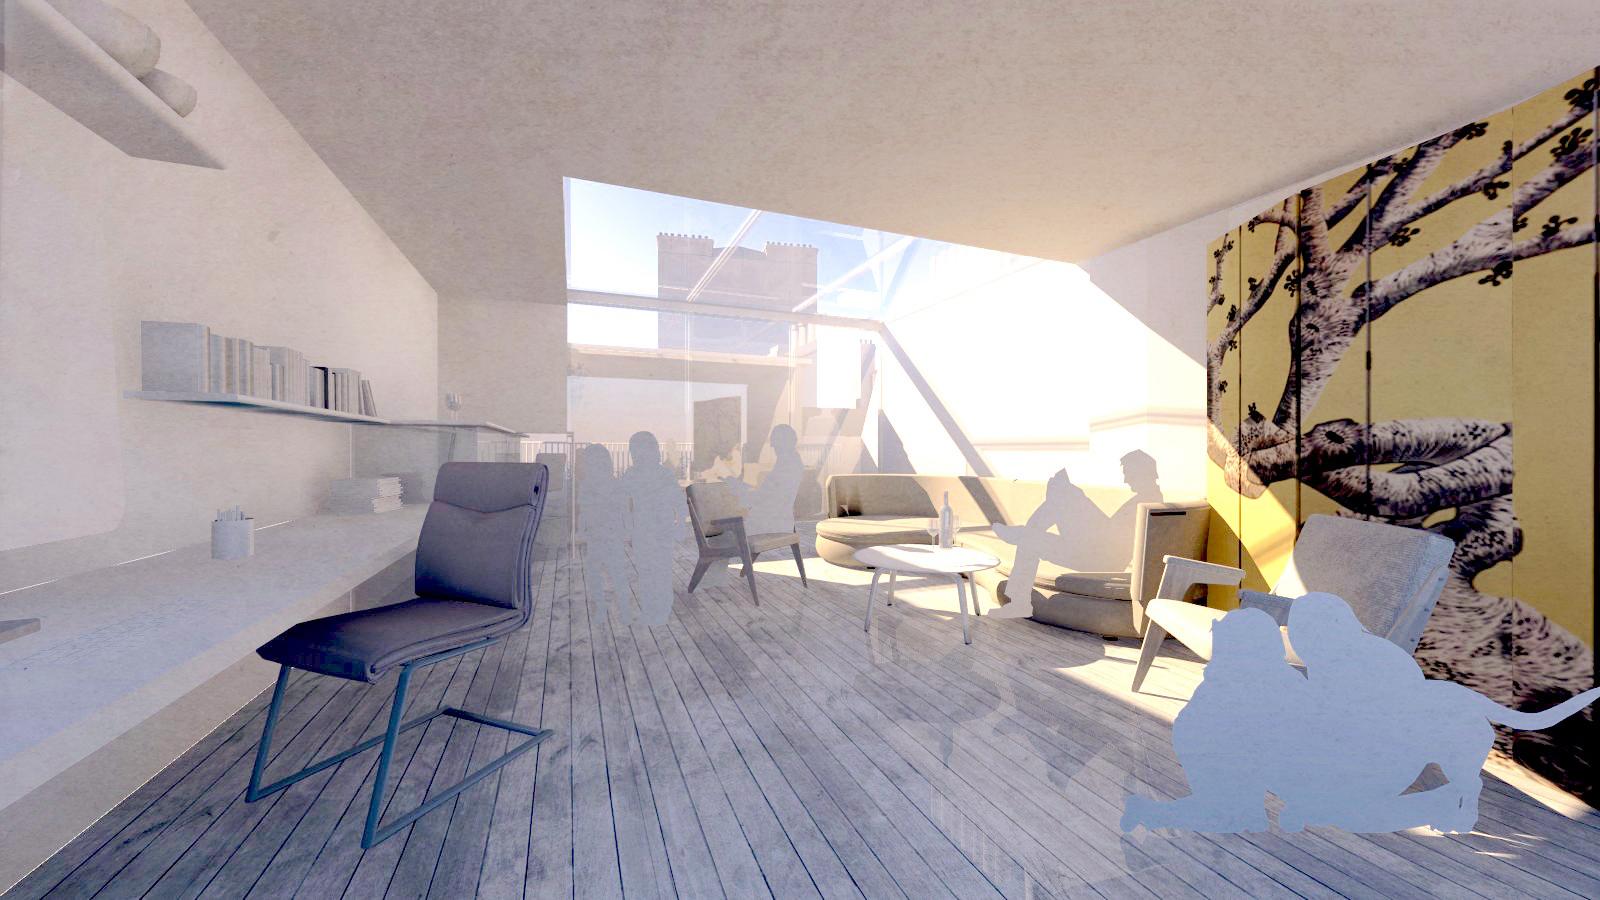 option for third floor during design development